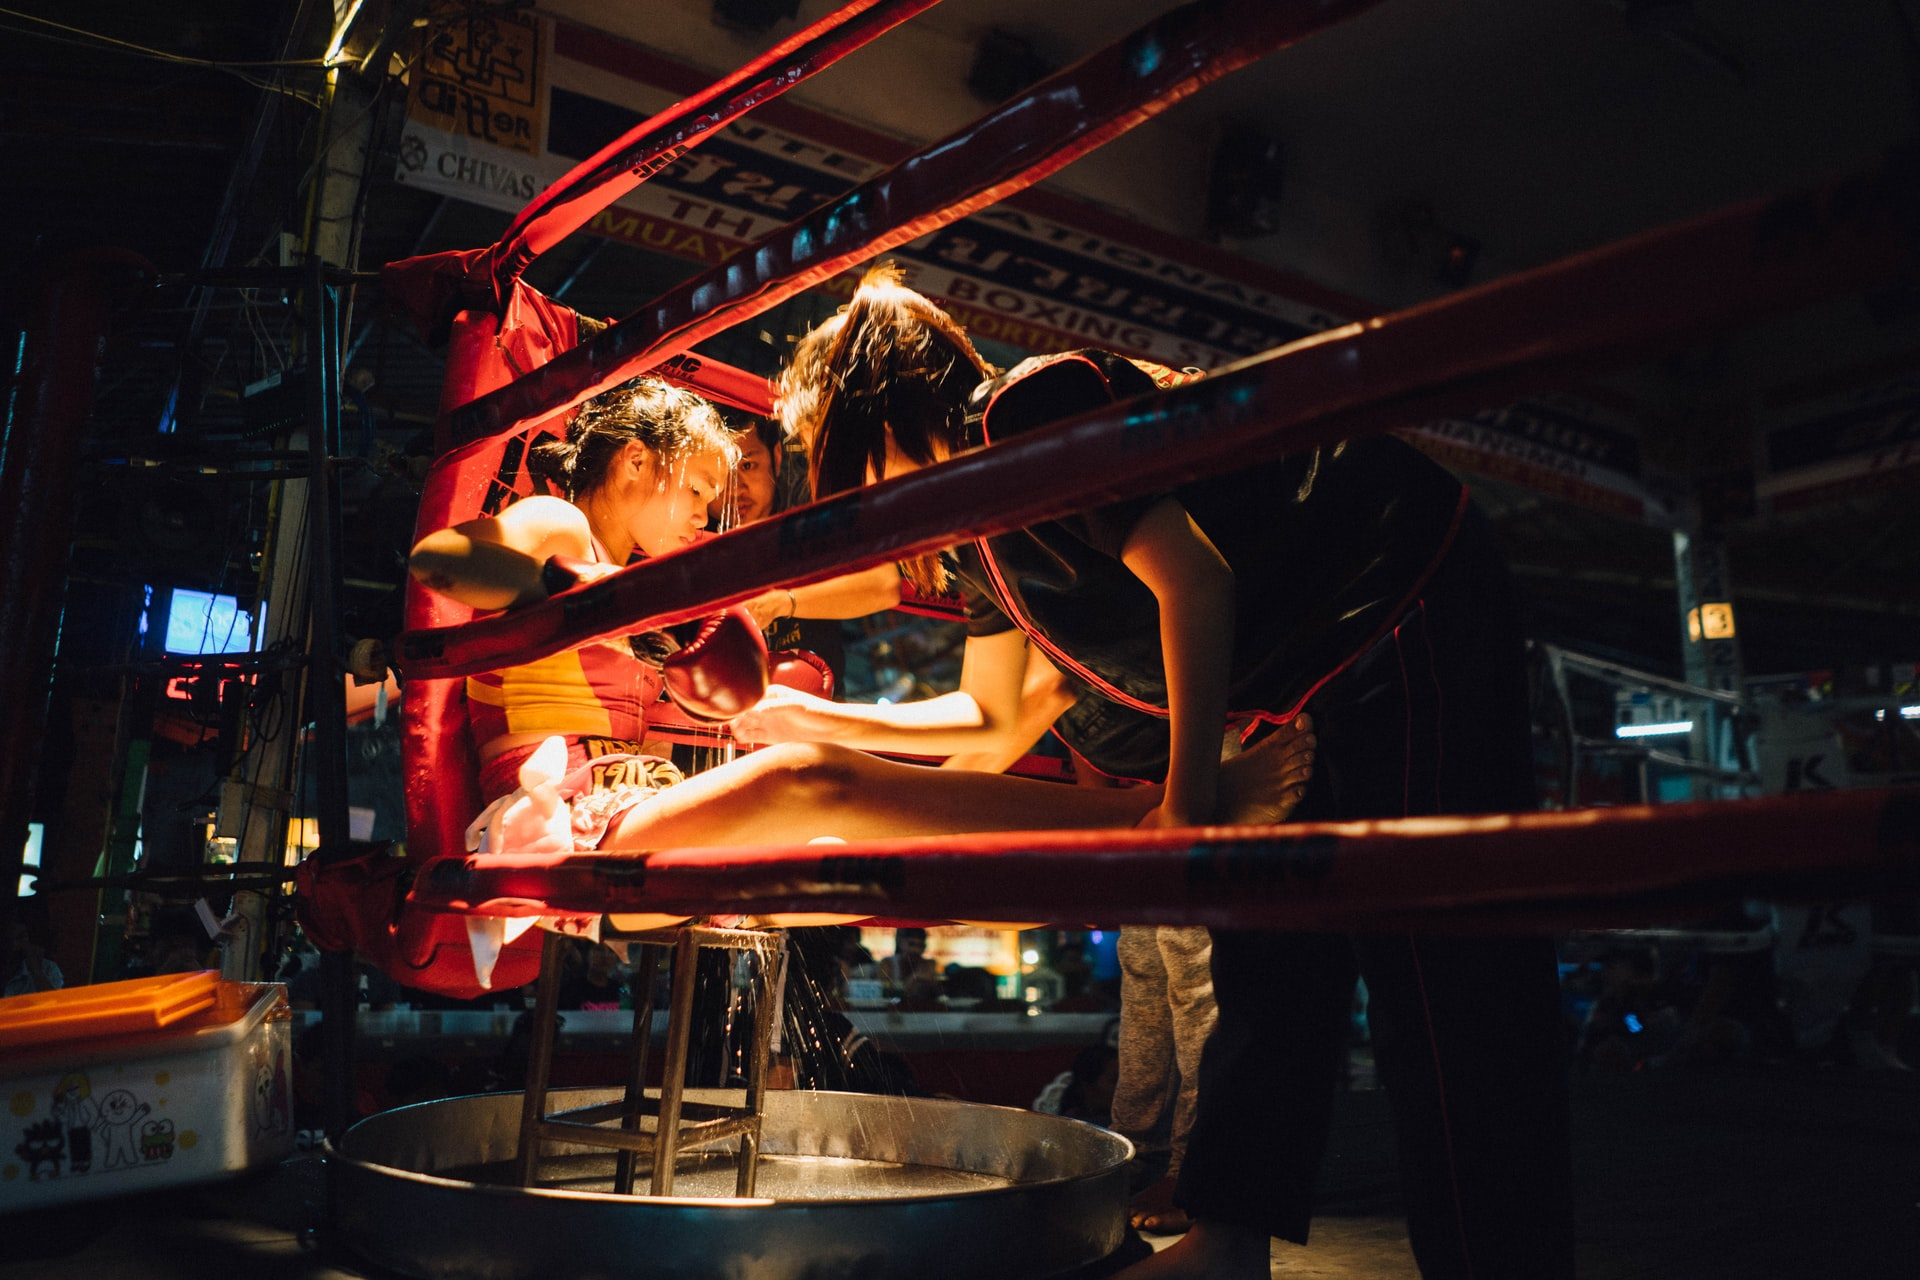 Typy na High League MMA